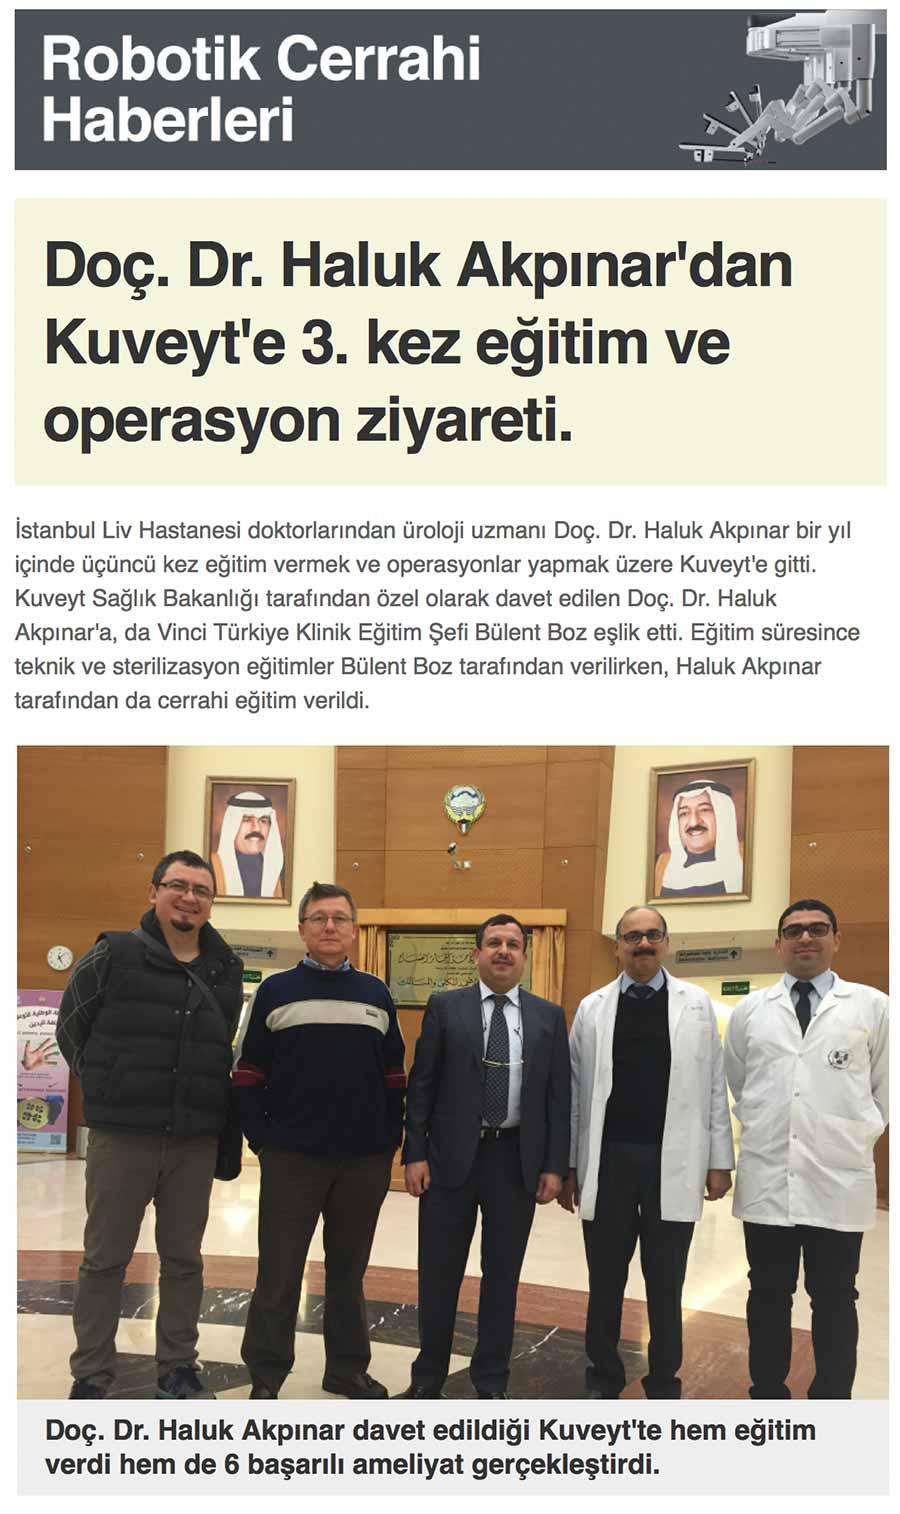 Kuveyt'te Robotik Cerrahi Eğitimi